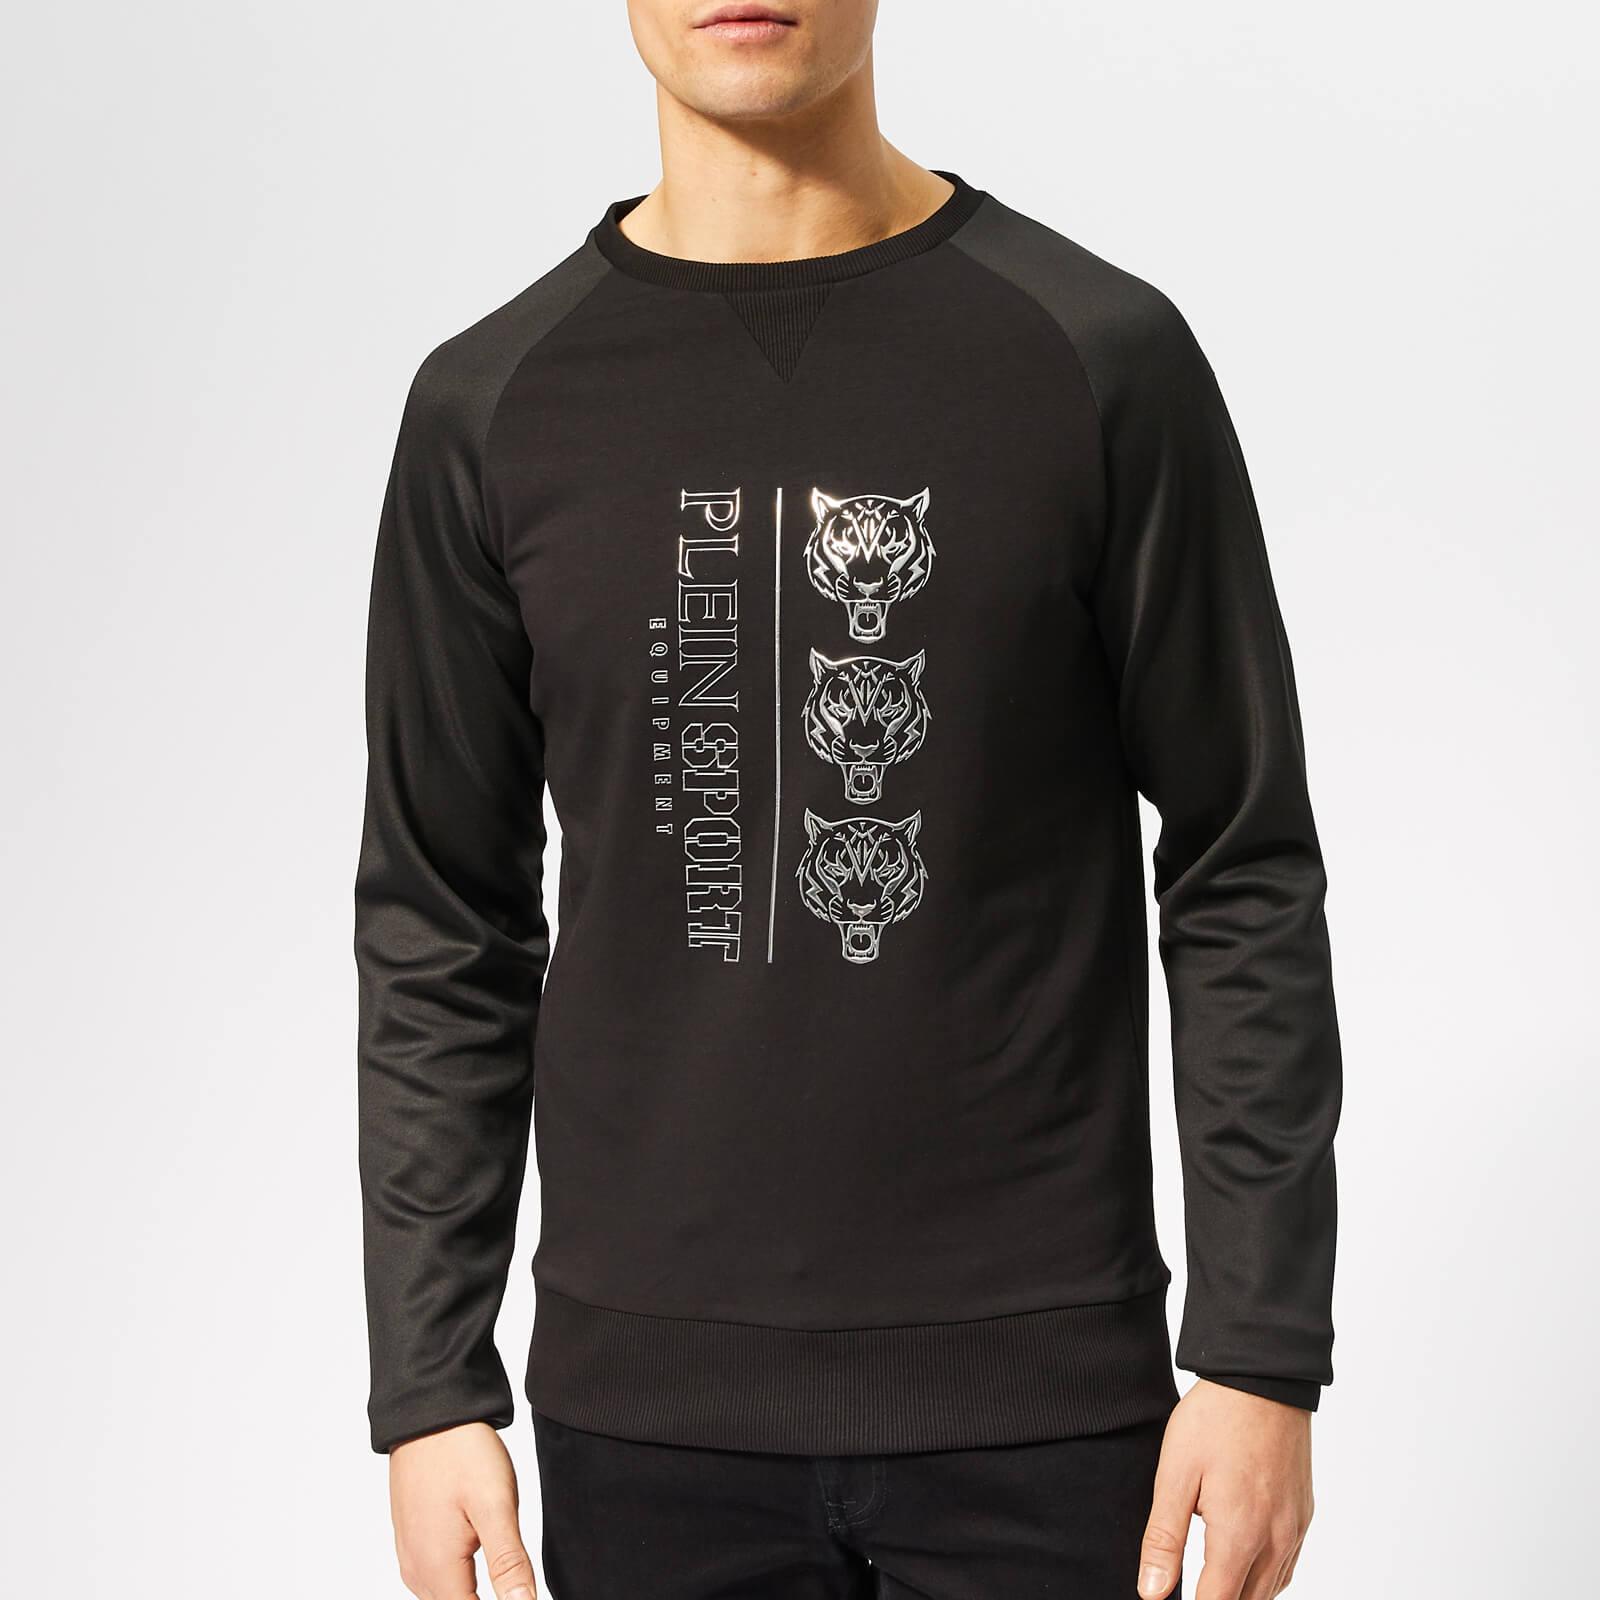 Plein Sport Men's Sweatshirt Long Sleeve Tiger - Black/Silver - M - Black/Silver